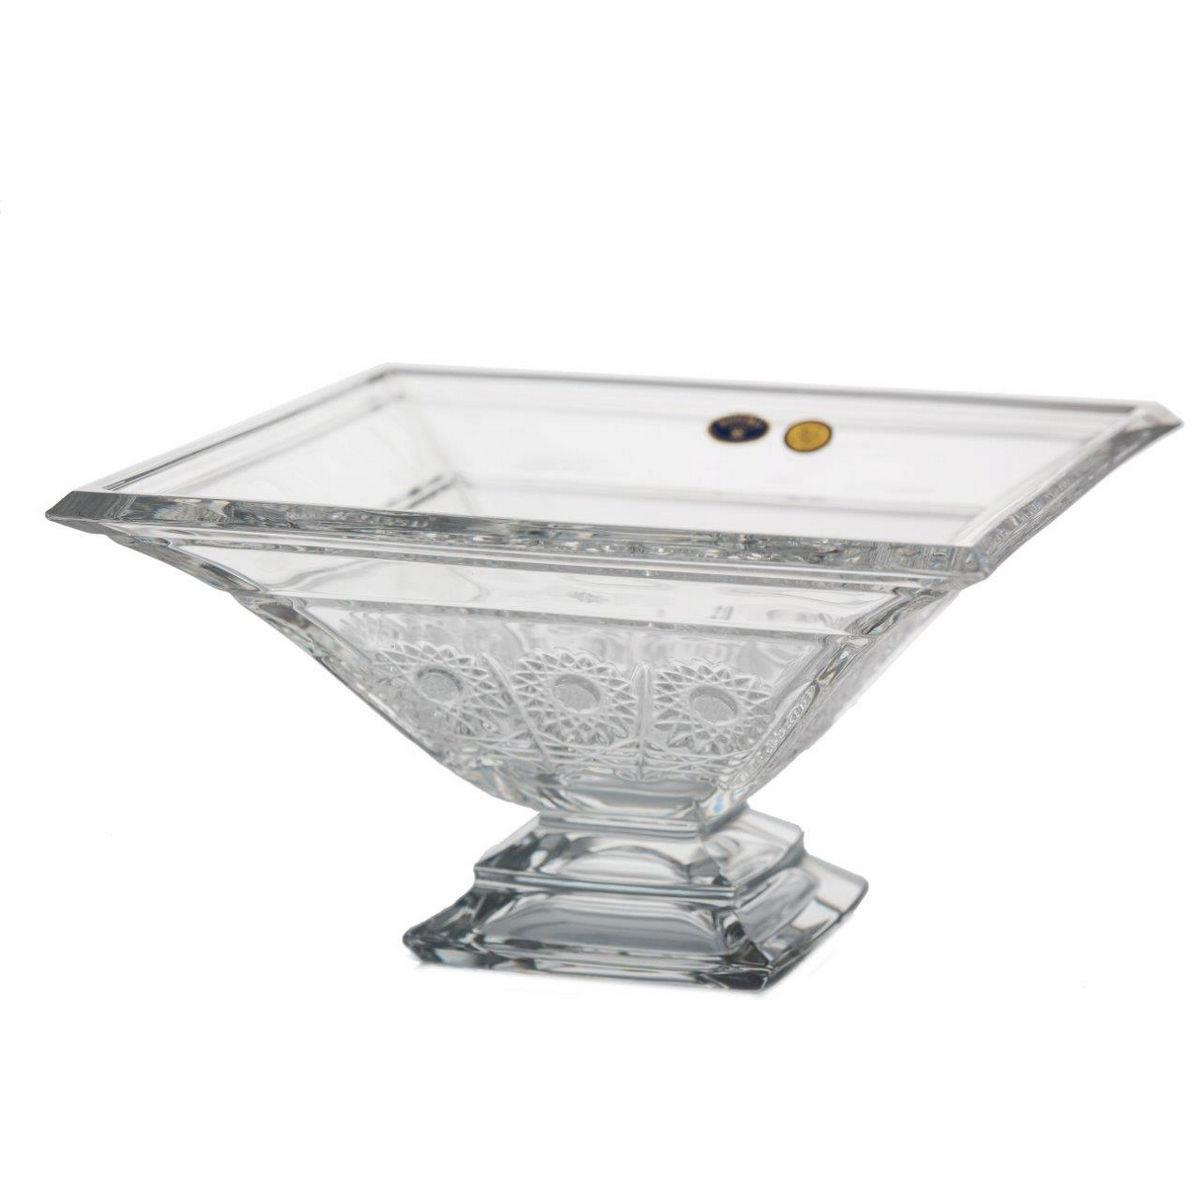 Fructiera Cristal Bohemia 35.5 Cm 2021 aranjareamesei.ro